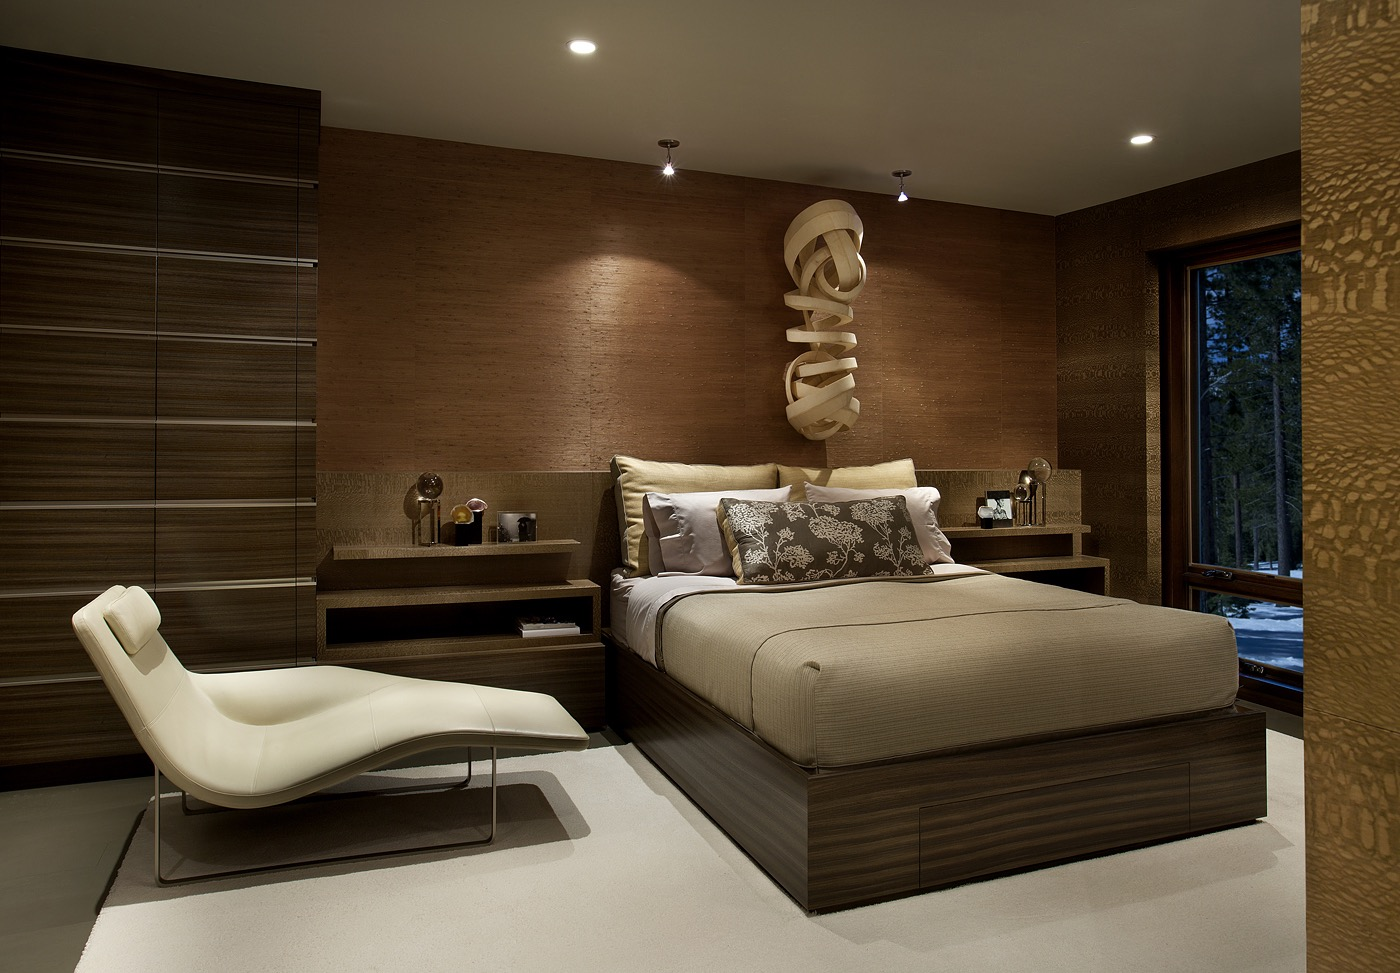 Modern Bedroom Decor In Comfortable Nuance #16733